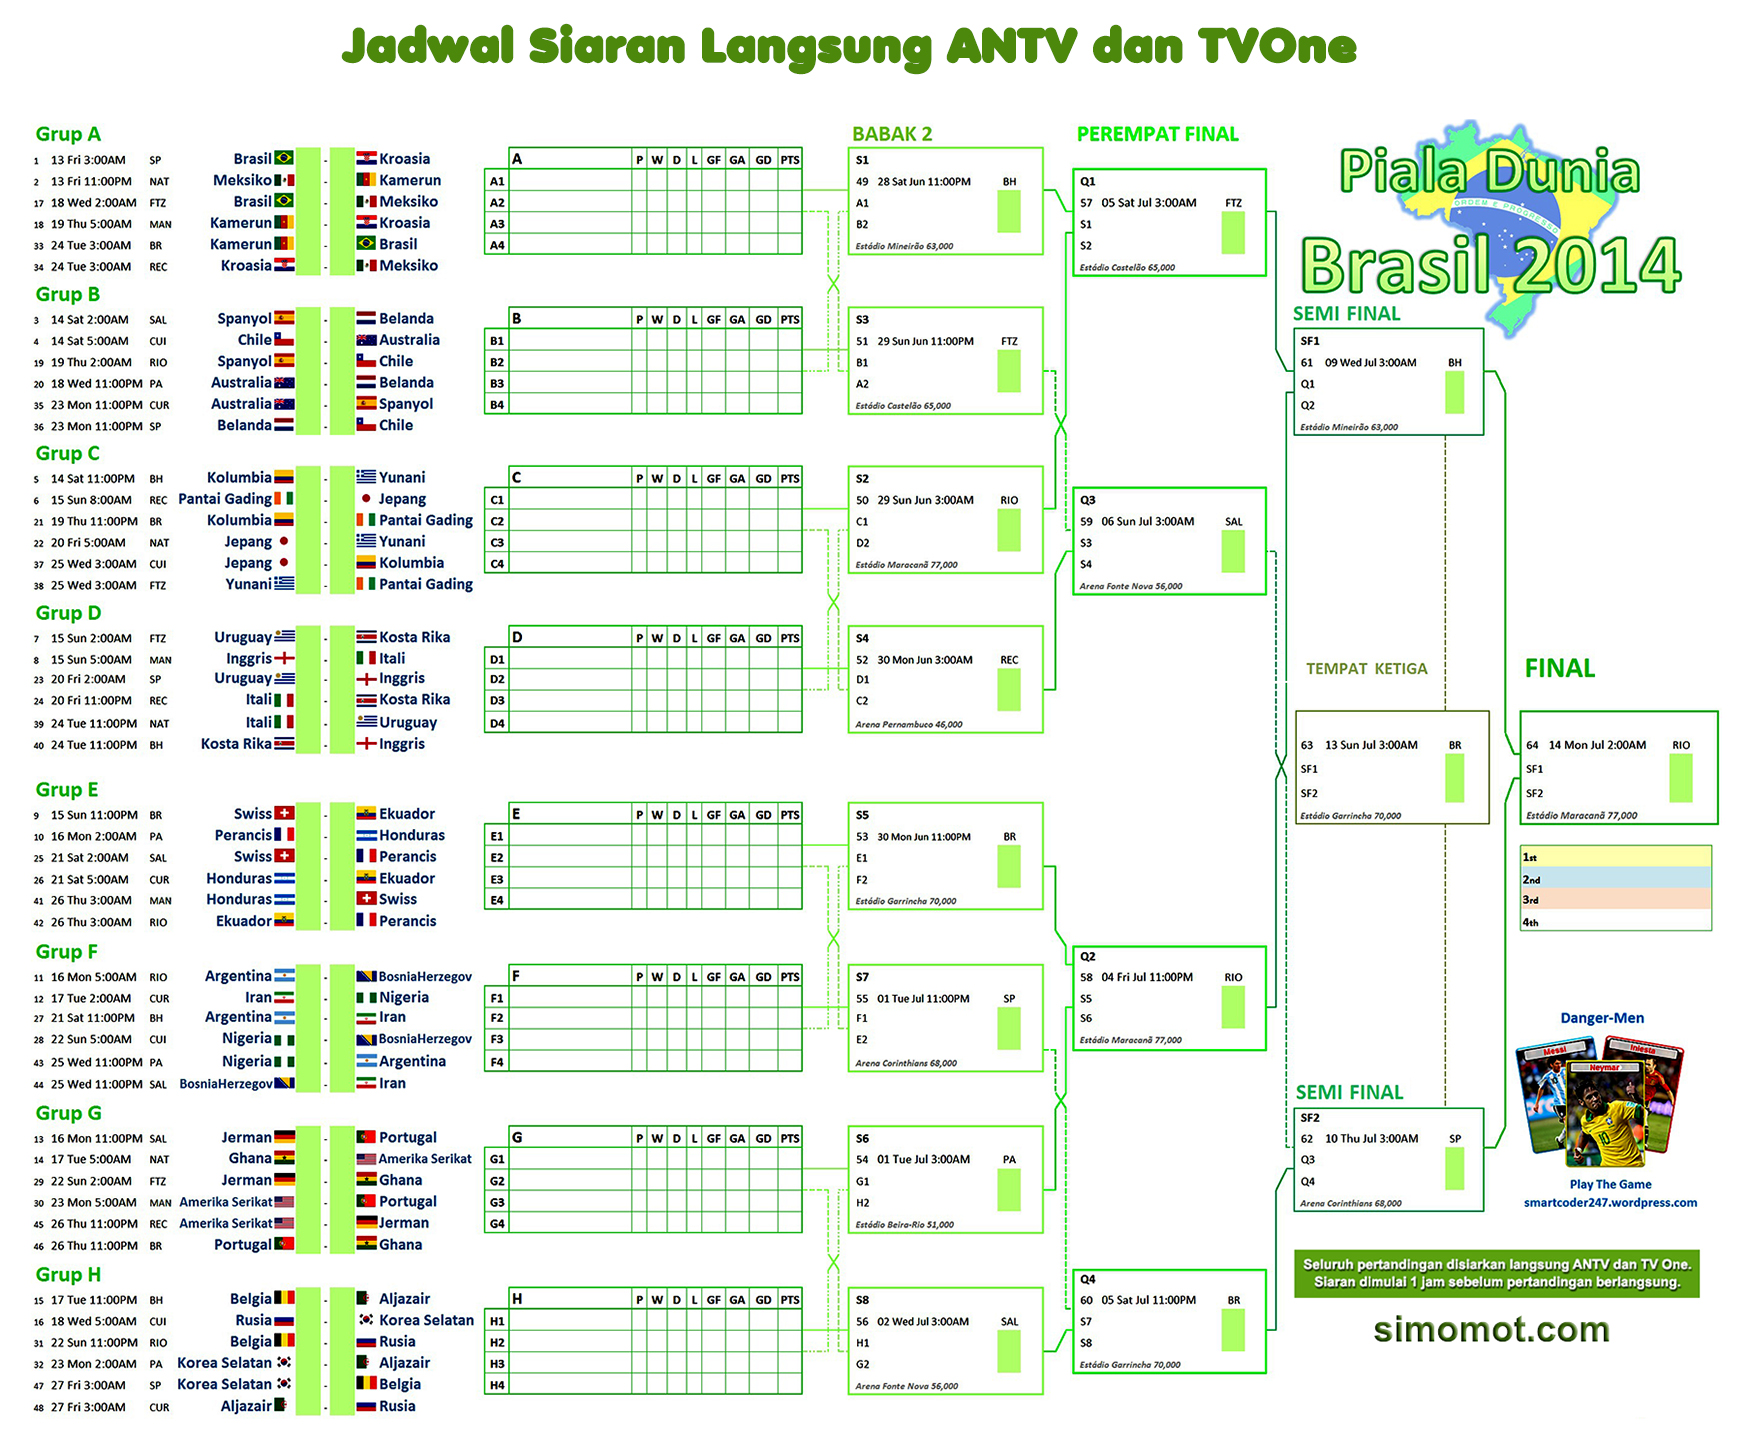 Jadwal siaran langsung pertandingan FIFA World Cup 2014 melalui ANTV